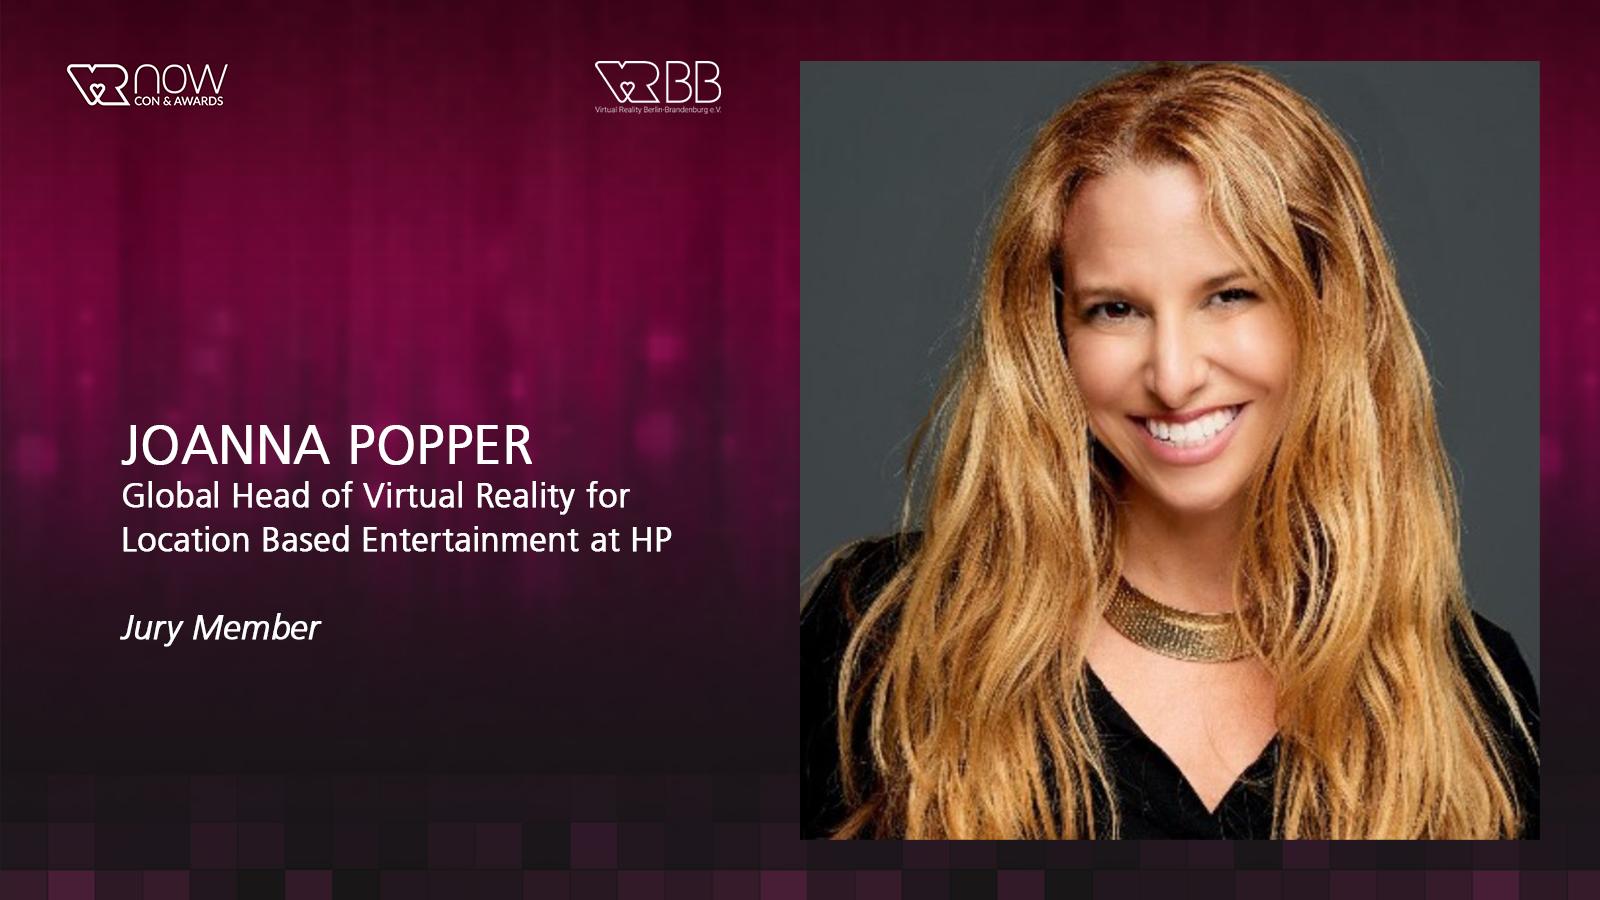 Joanna Popper